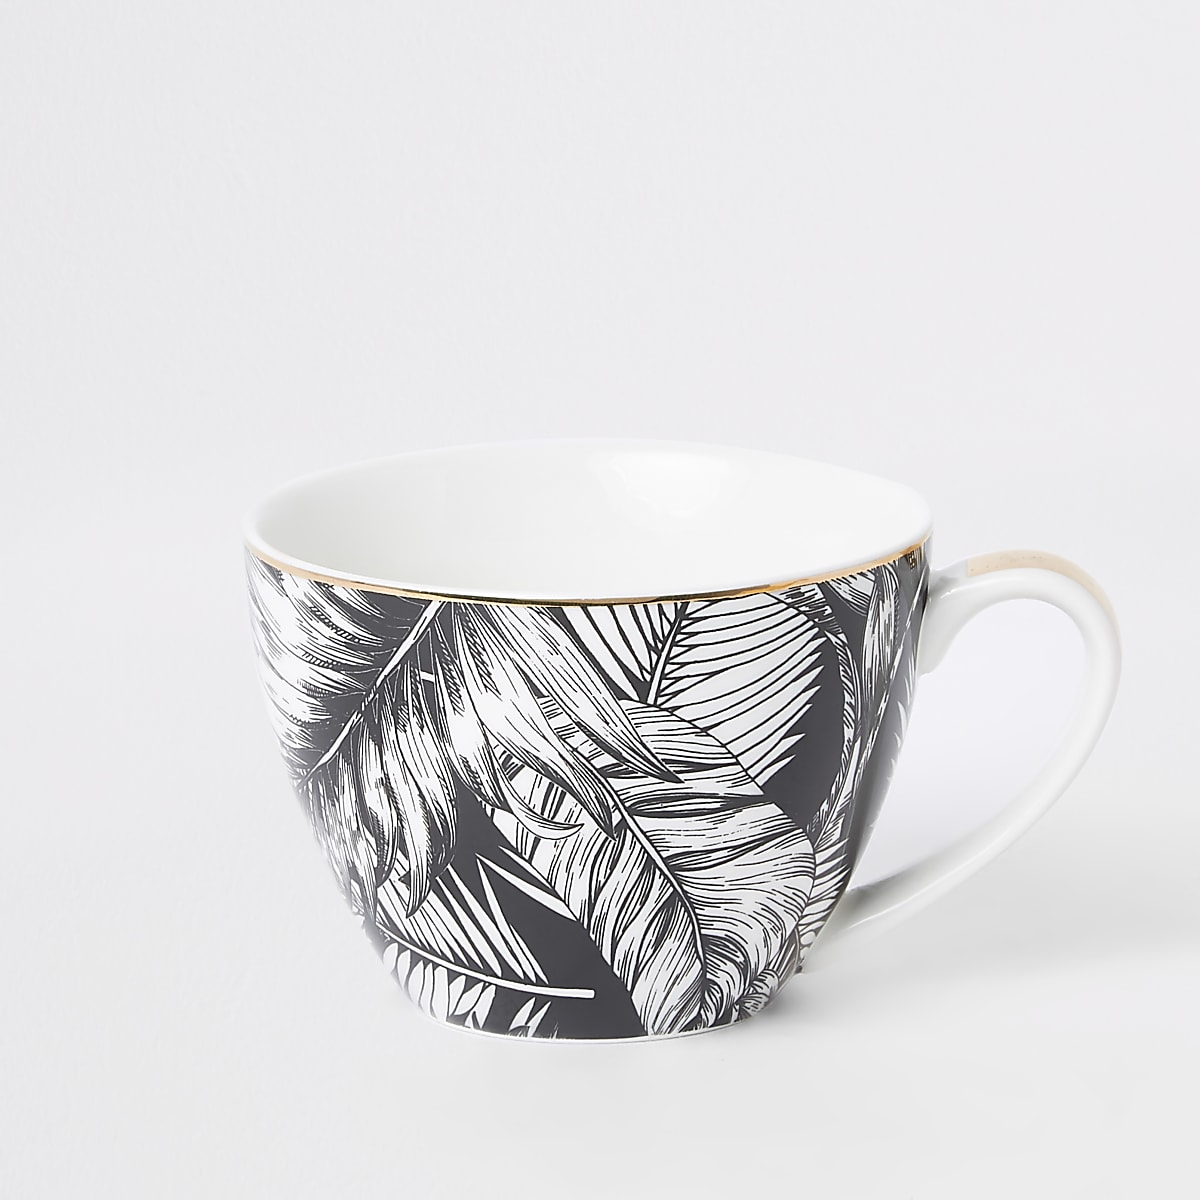 Zwart-witte mok met bladprint